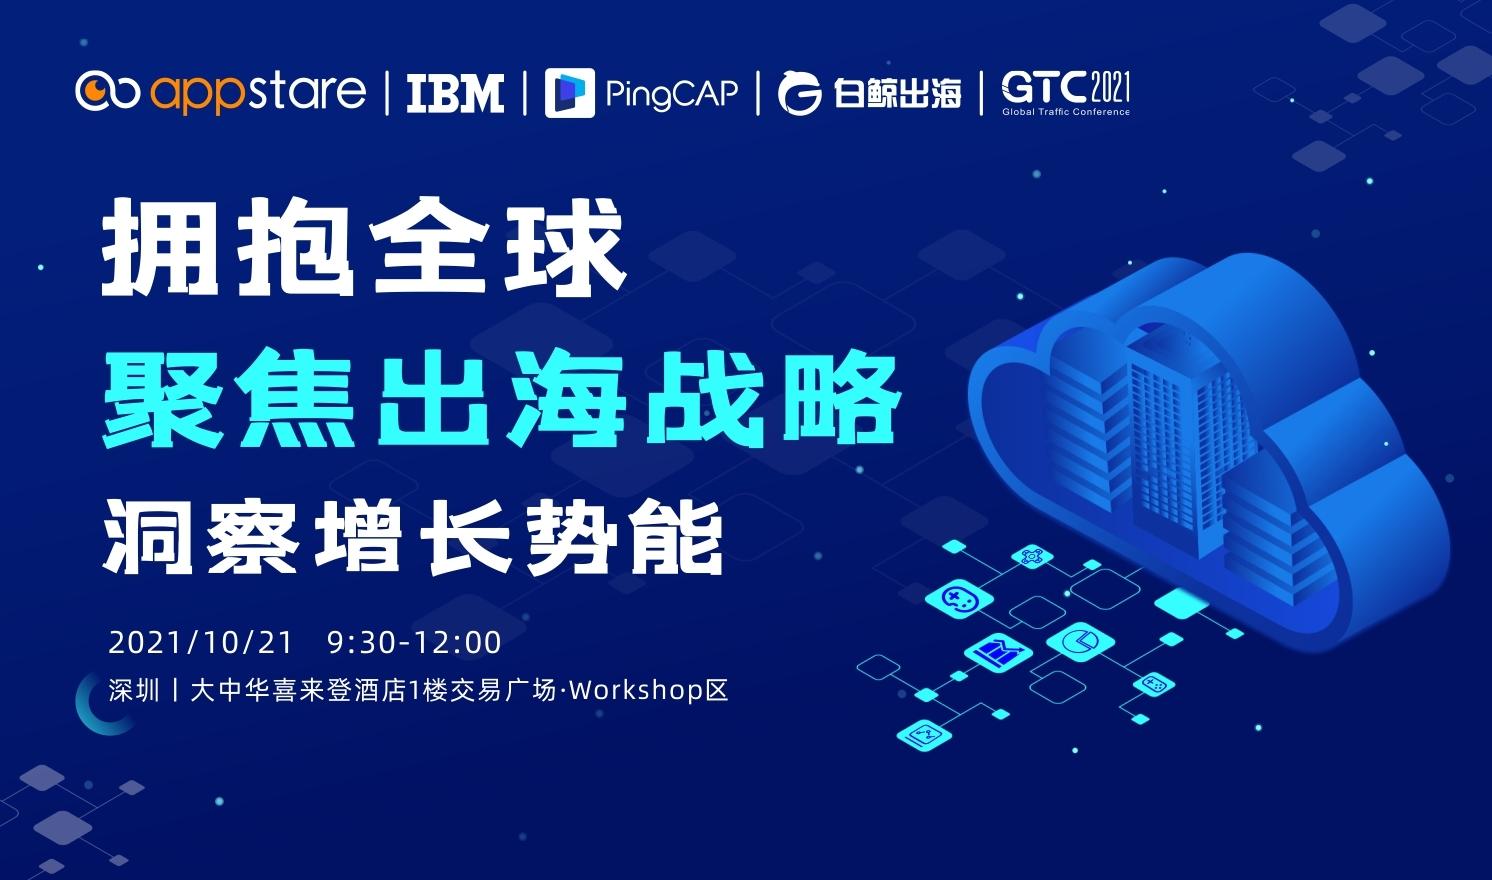 GTC2021全球流量大会—拥抱全球 聚焦出海战略 洞察增长势能Workshop上午场(2021-10-21)